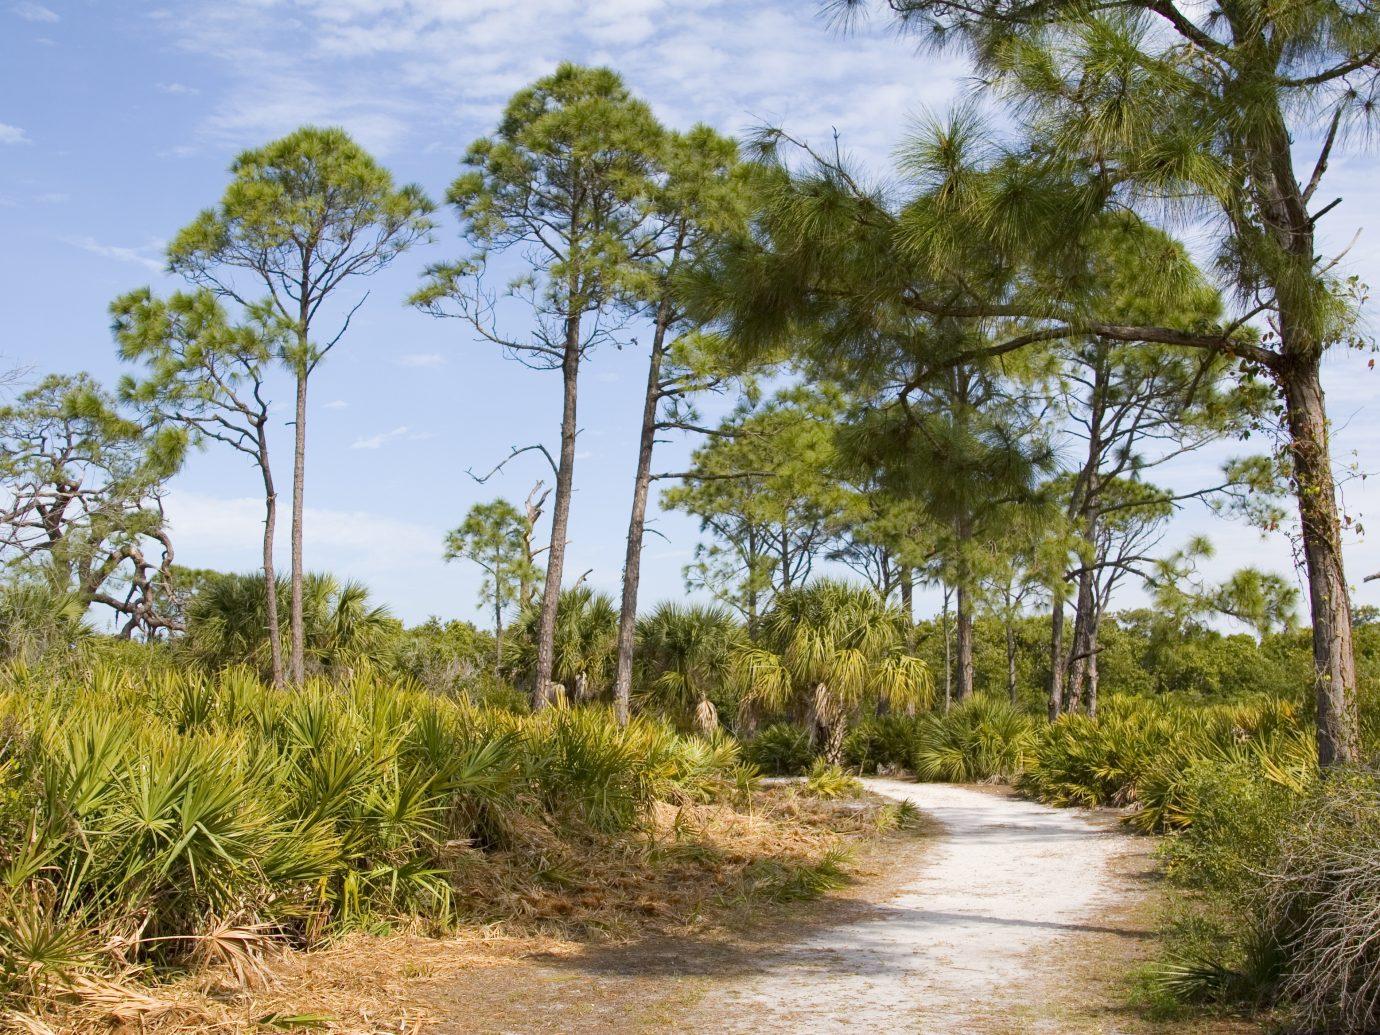 Caladesi Island, a natural beauty on Florida's Gulf Coast